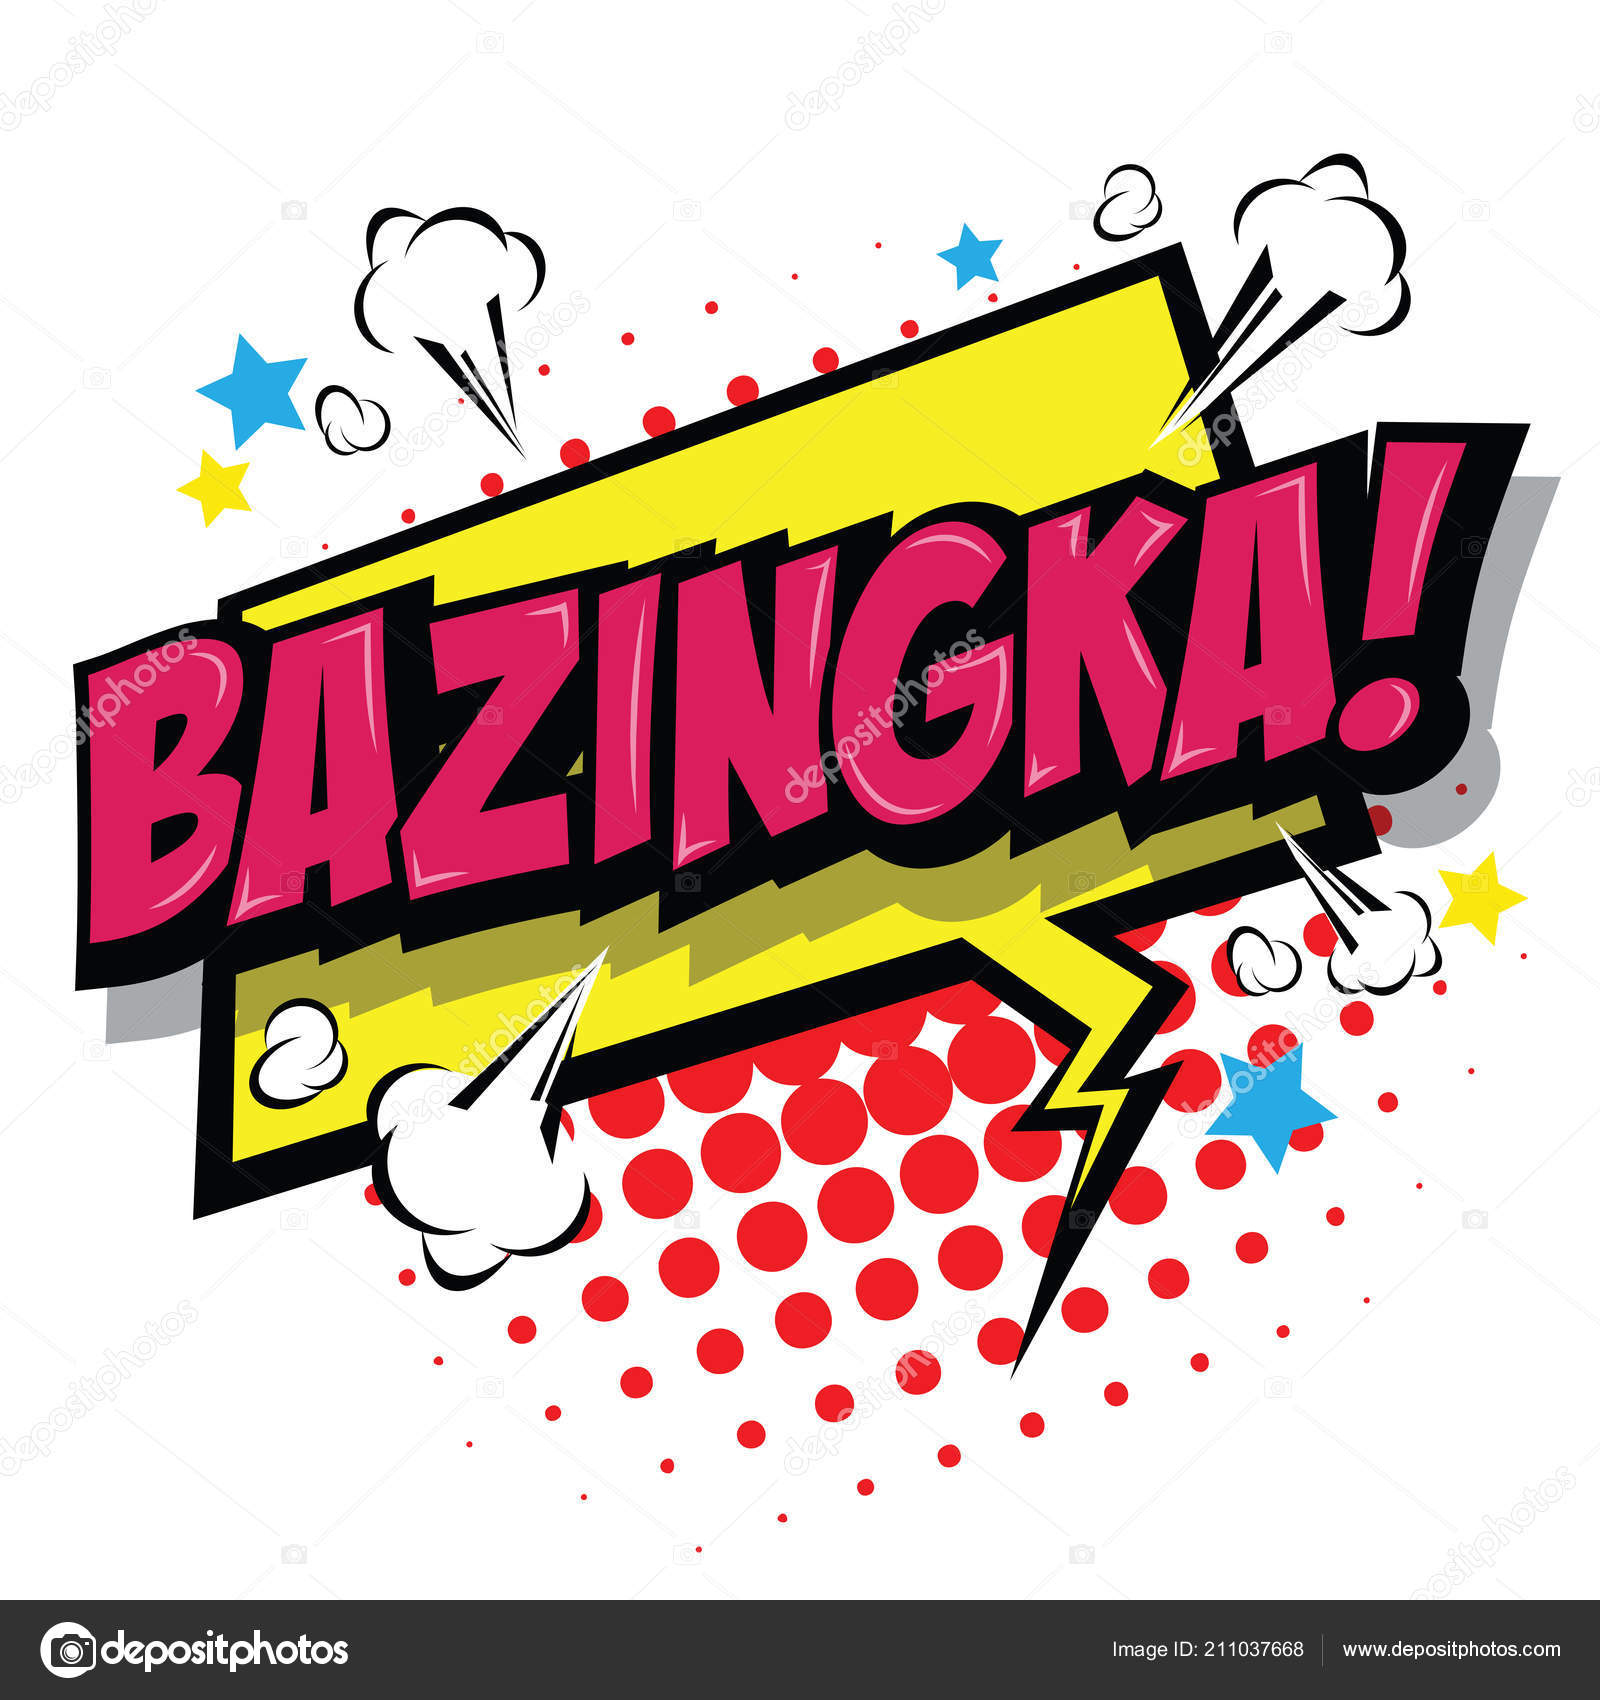 Bazinga comic speech bubble cartoon art illustration vector file.